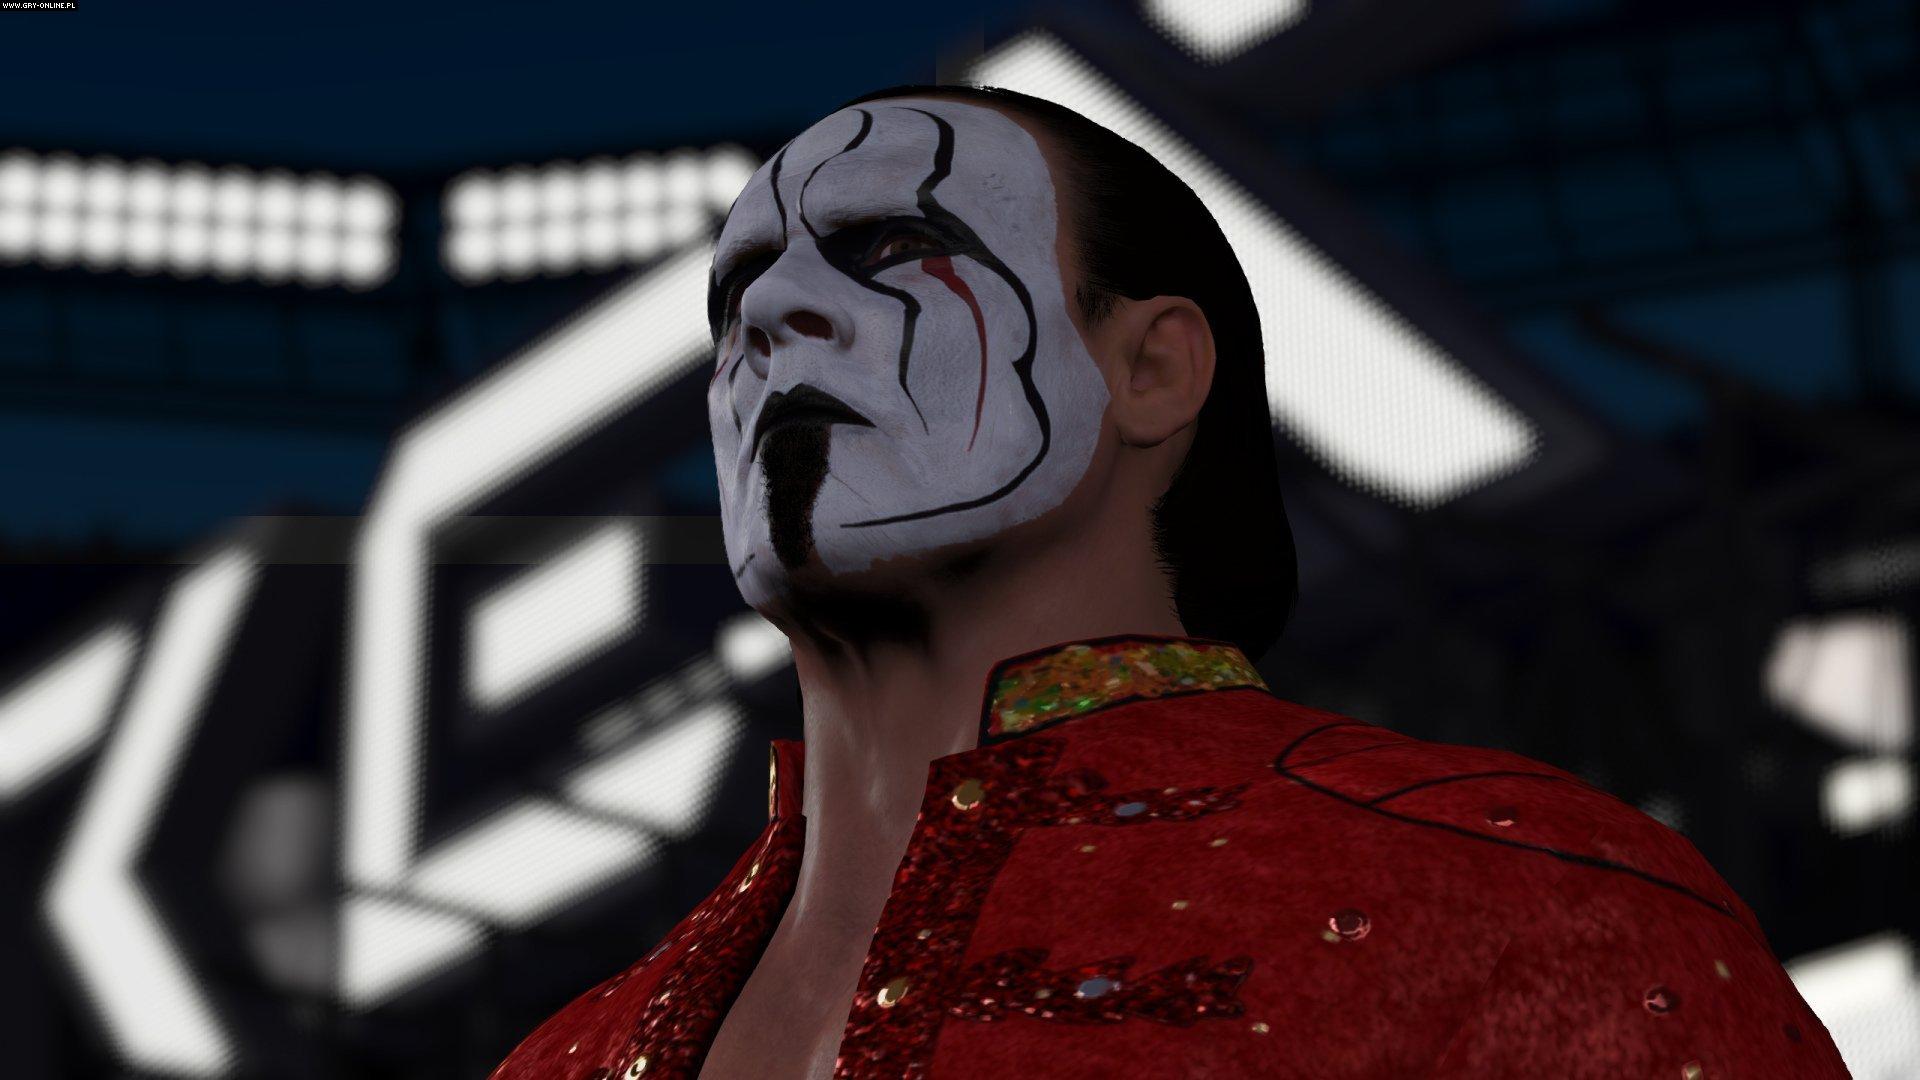 WWE 2K16 X360, PS3, XONE, PS4 Games Image 19/22, Yuke's, 2K Games